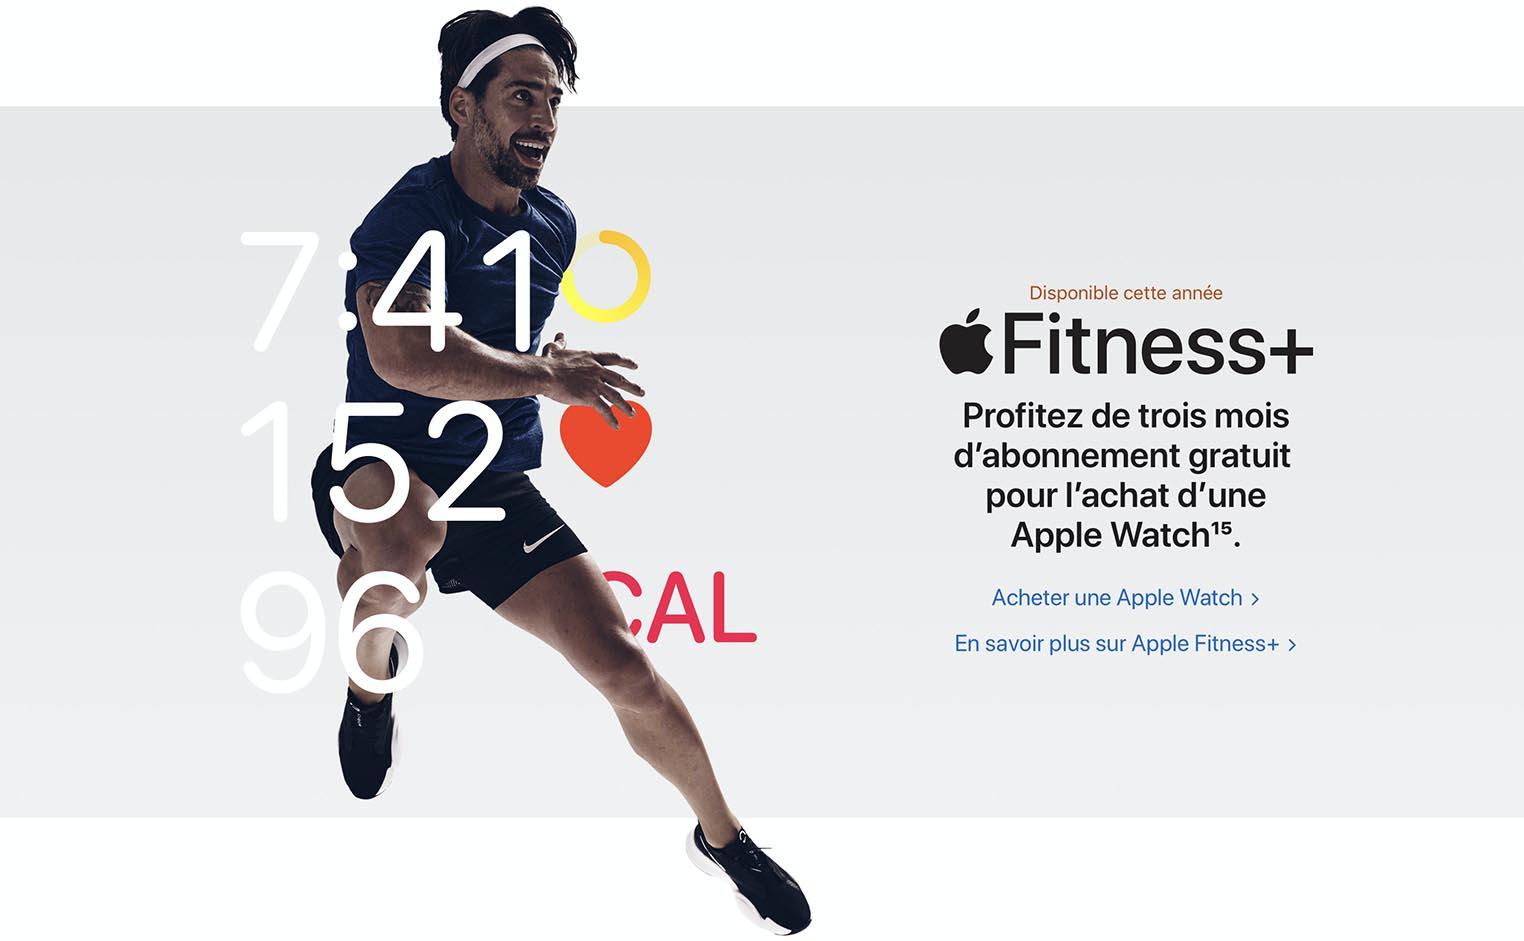 Apple Fitness+ France